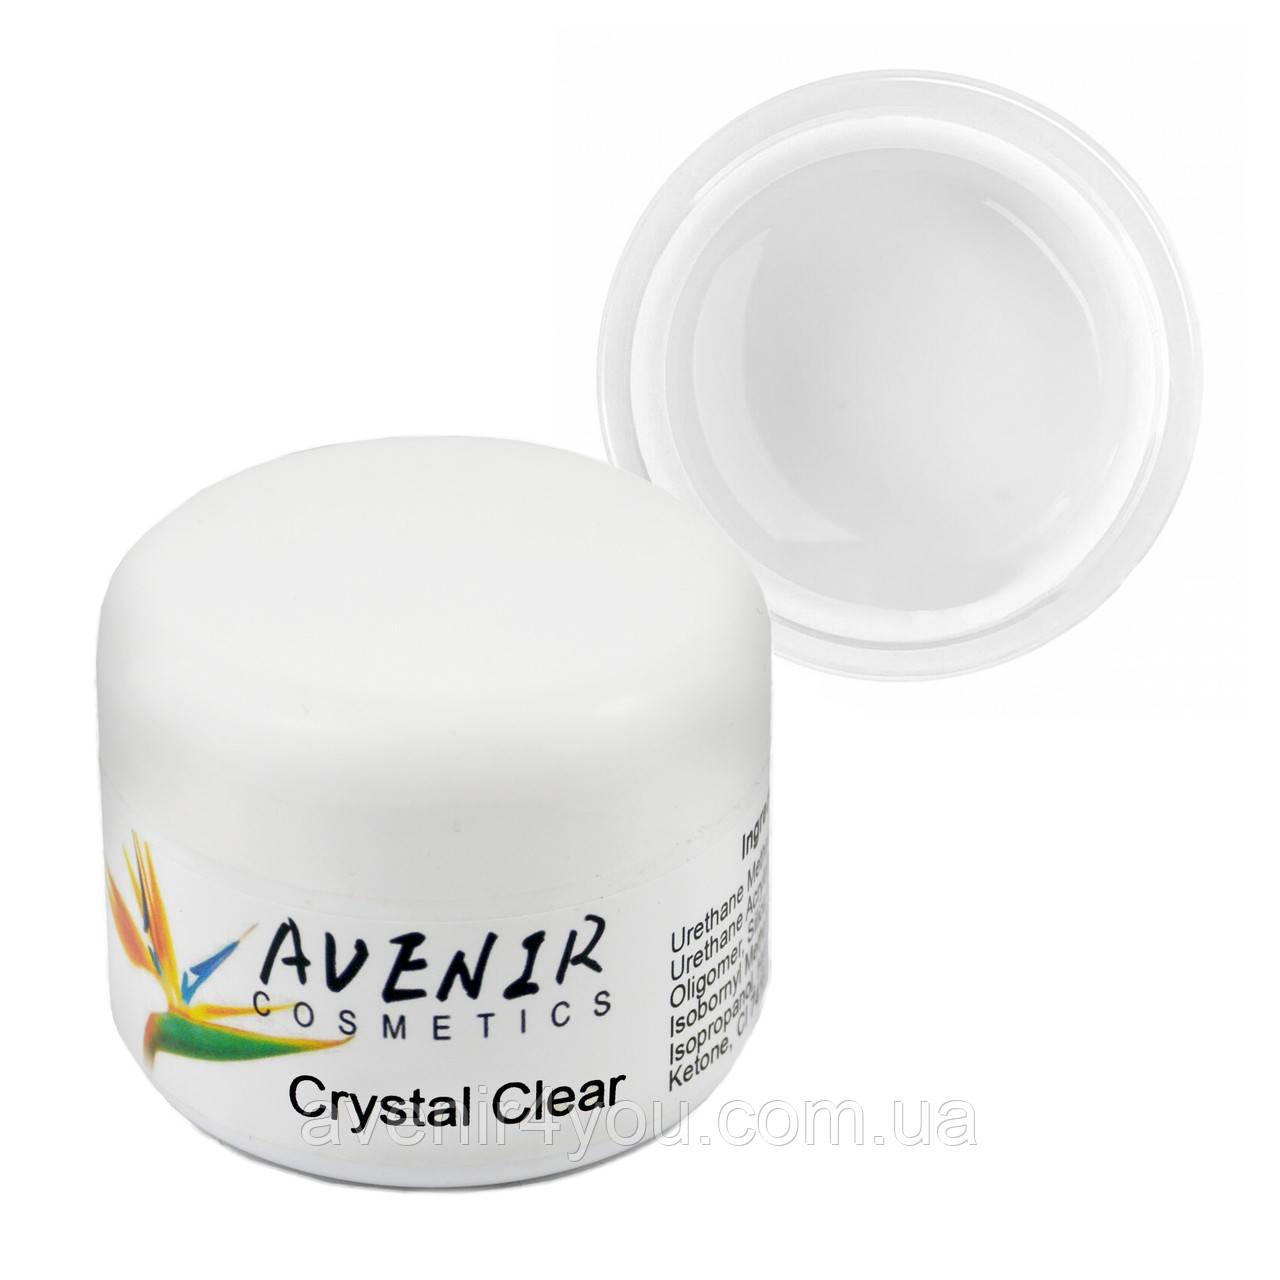 Гель для наращивания Crystal clear Avenir 30 мл